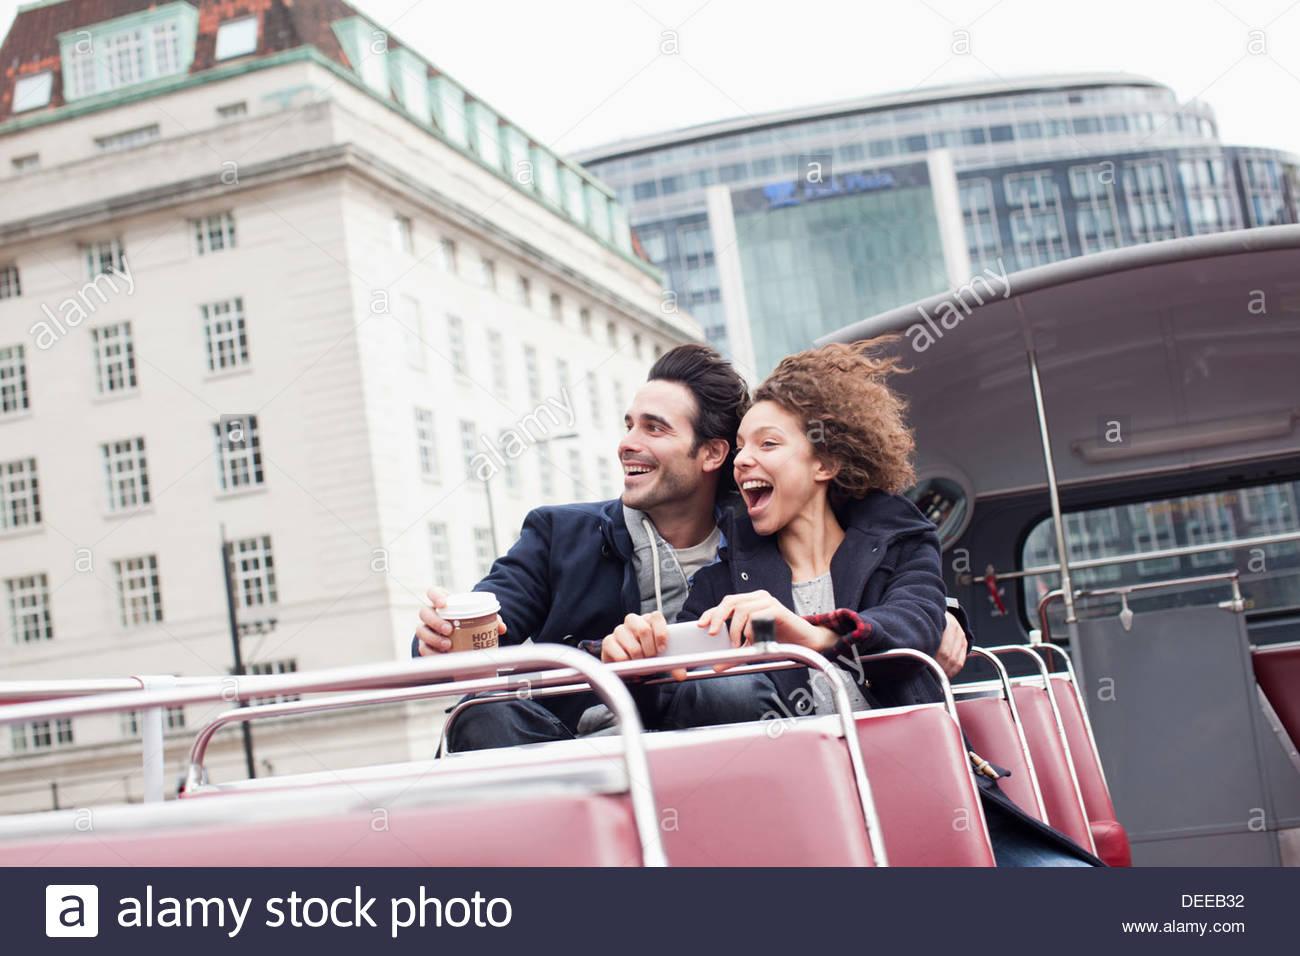 Exuberant couple riding double decker bus in London - Stock Image